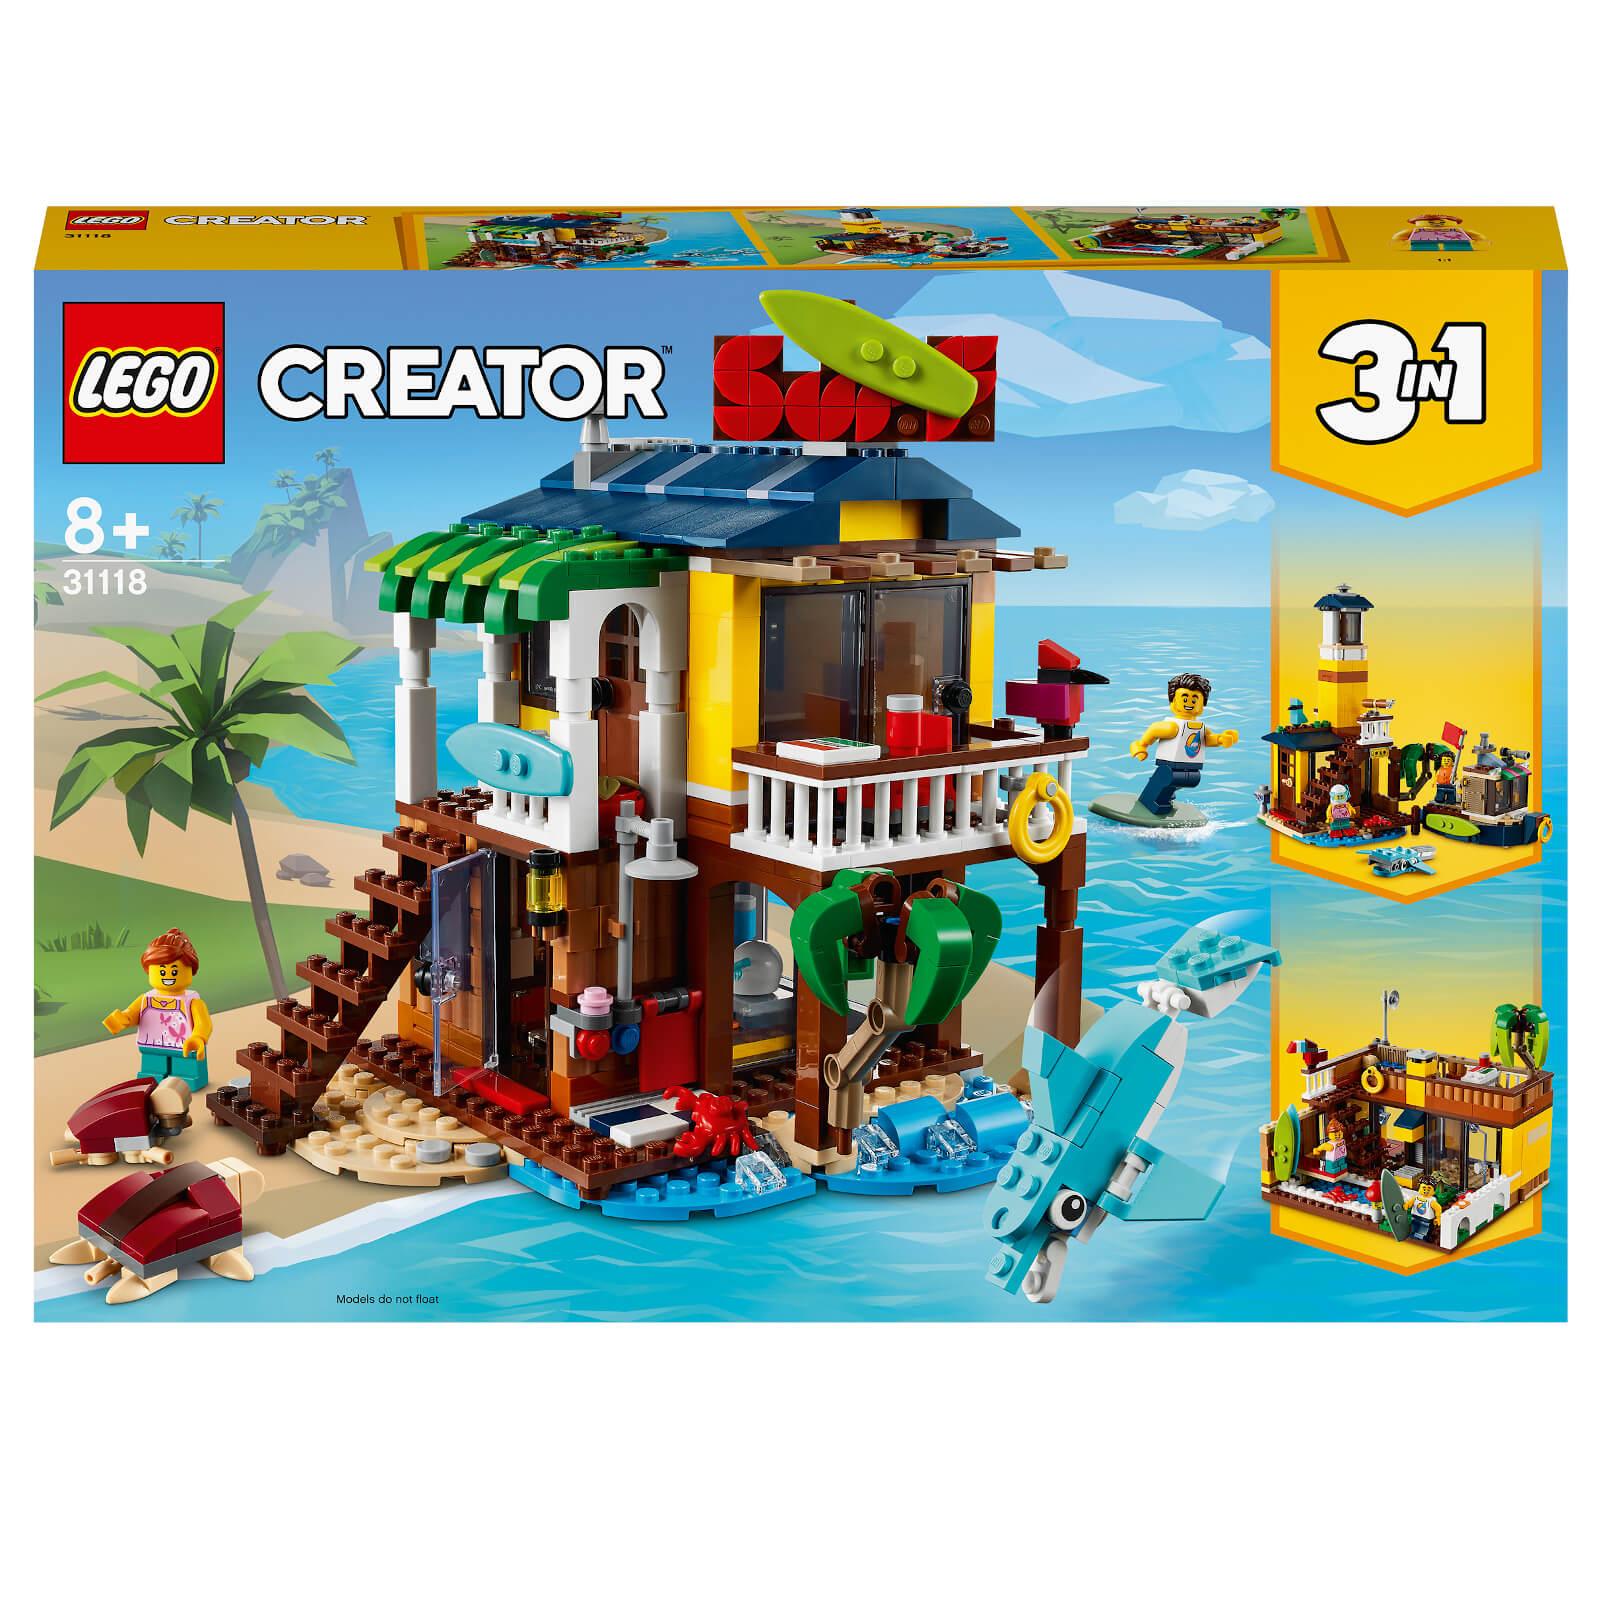 Image of LEGO Creator Surfer Beach House - 31118